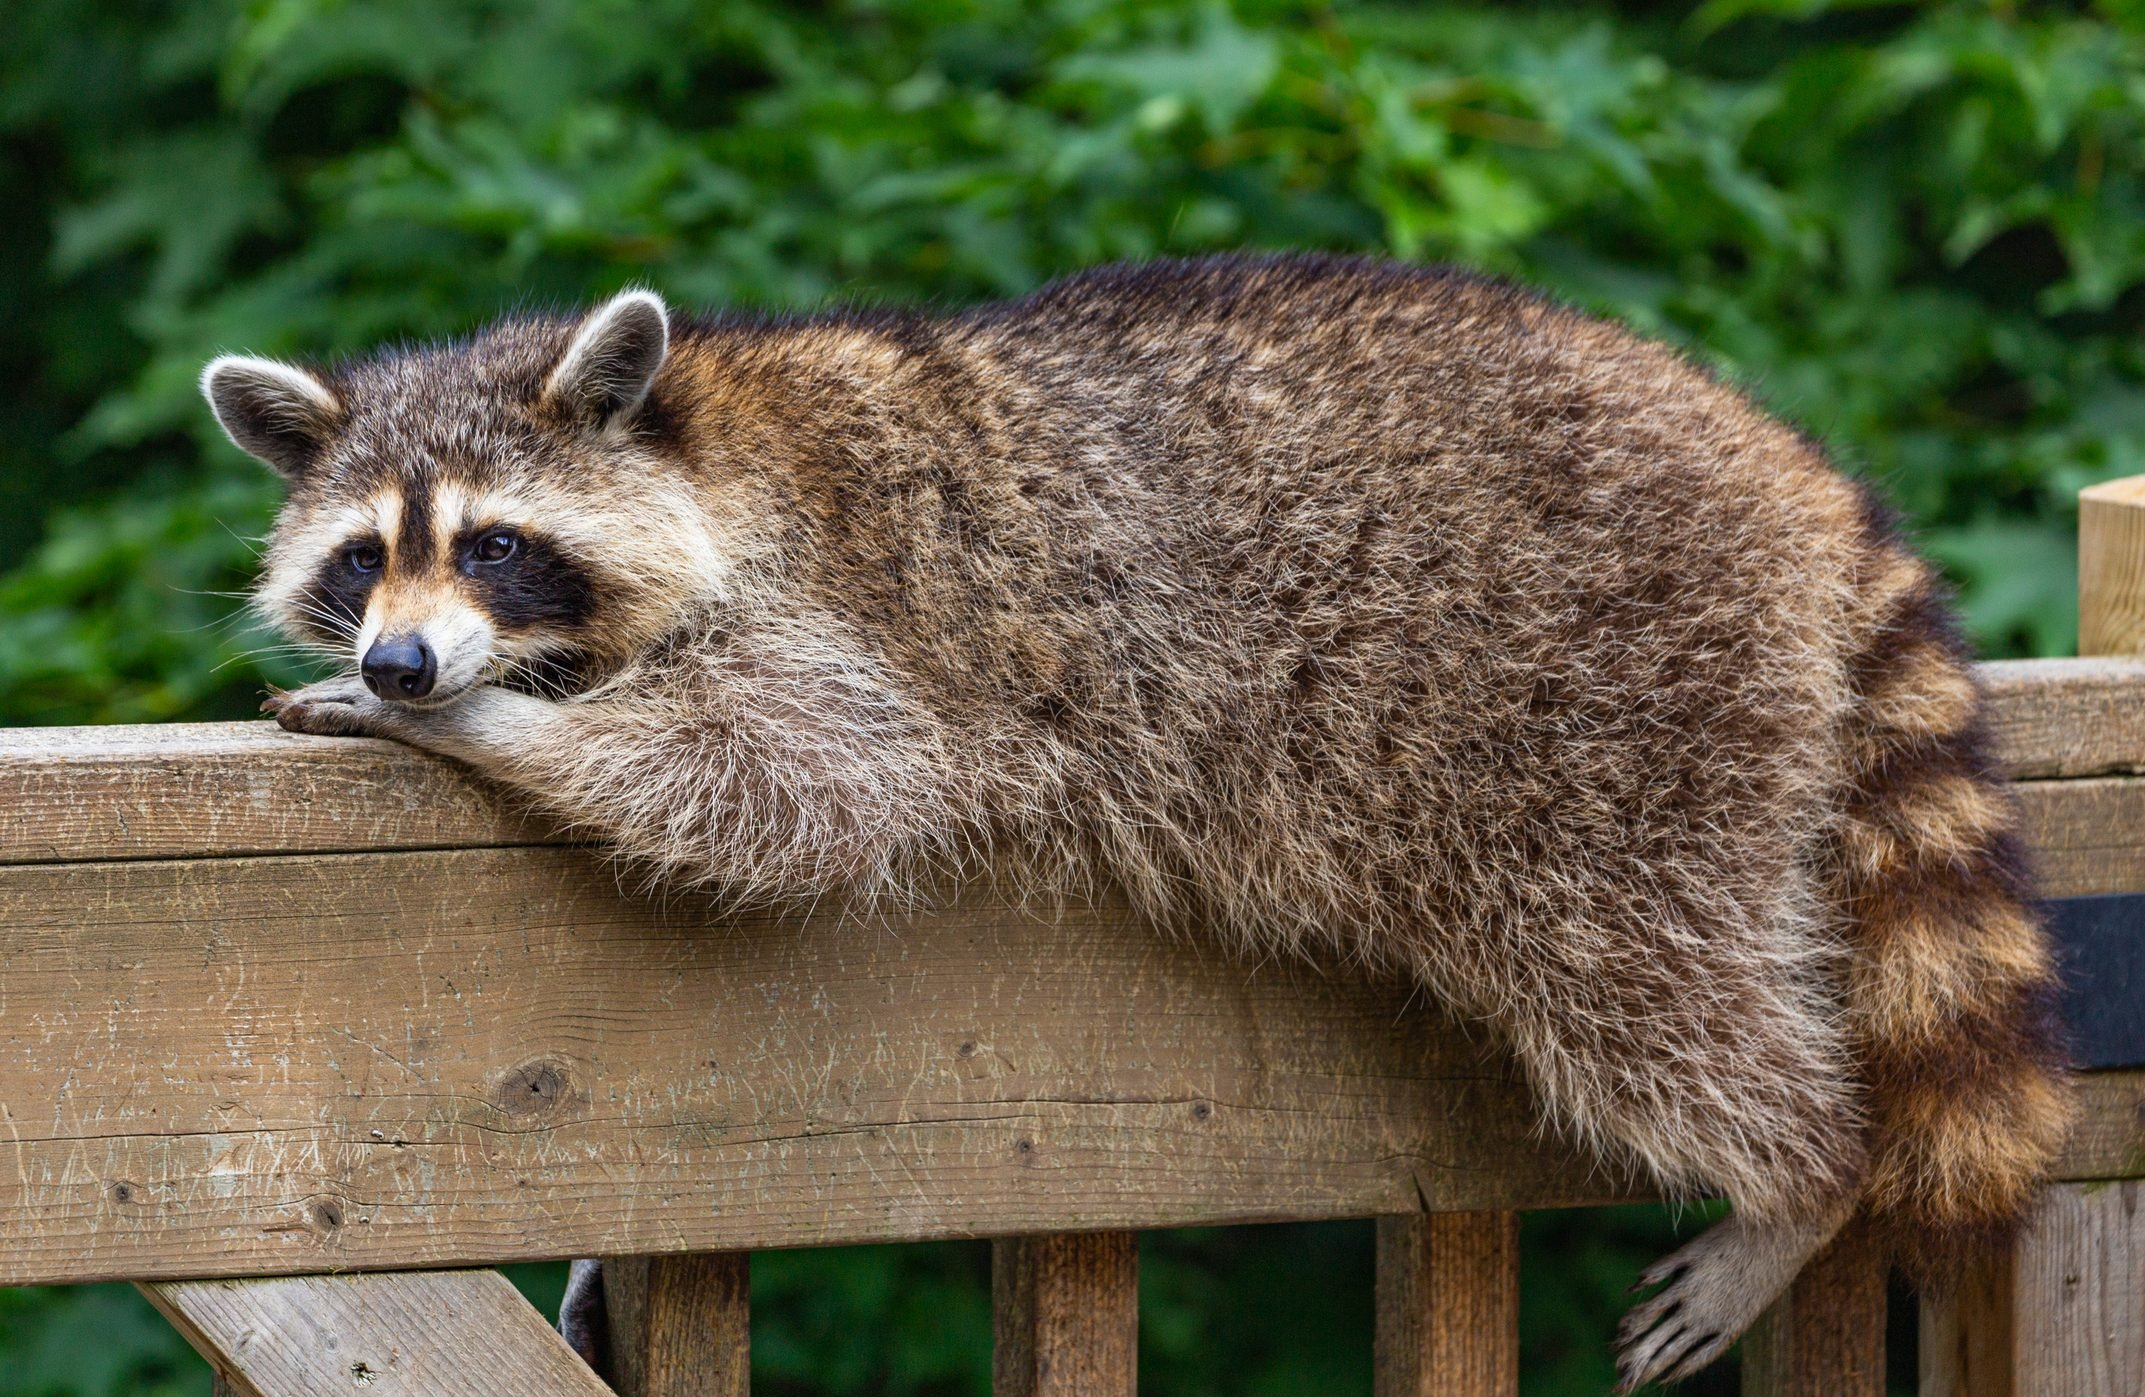 Portrait Of A Raccoon Resting On A Wood Railing.